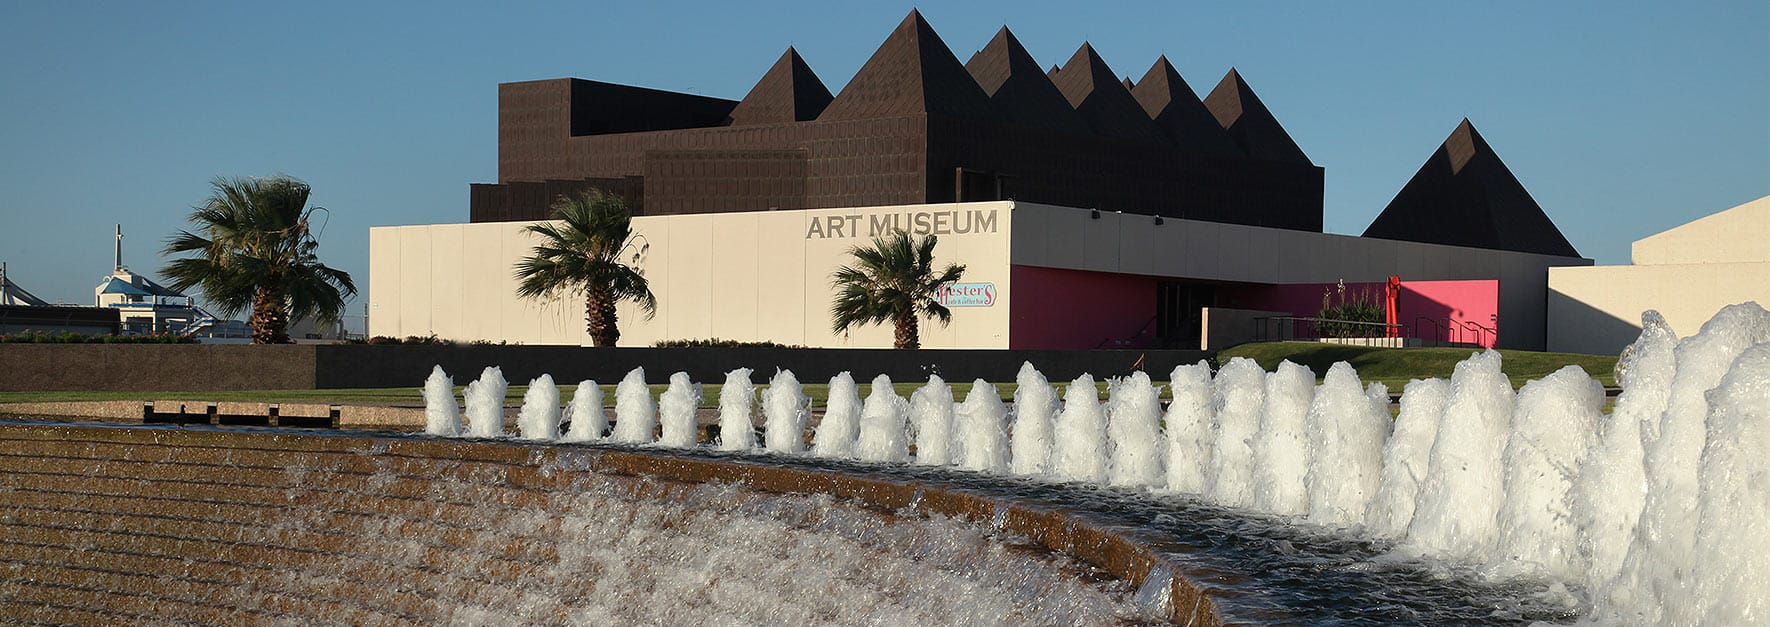 Corpus Christi Art Museum